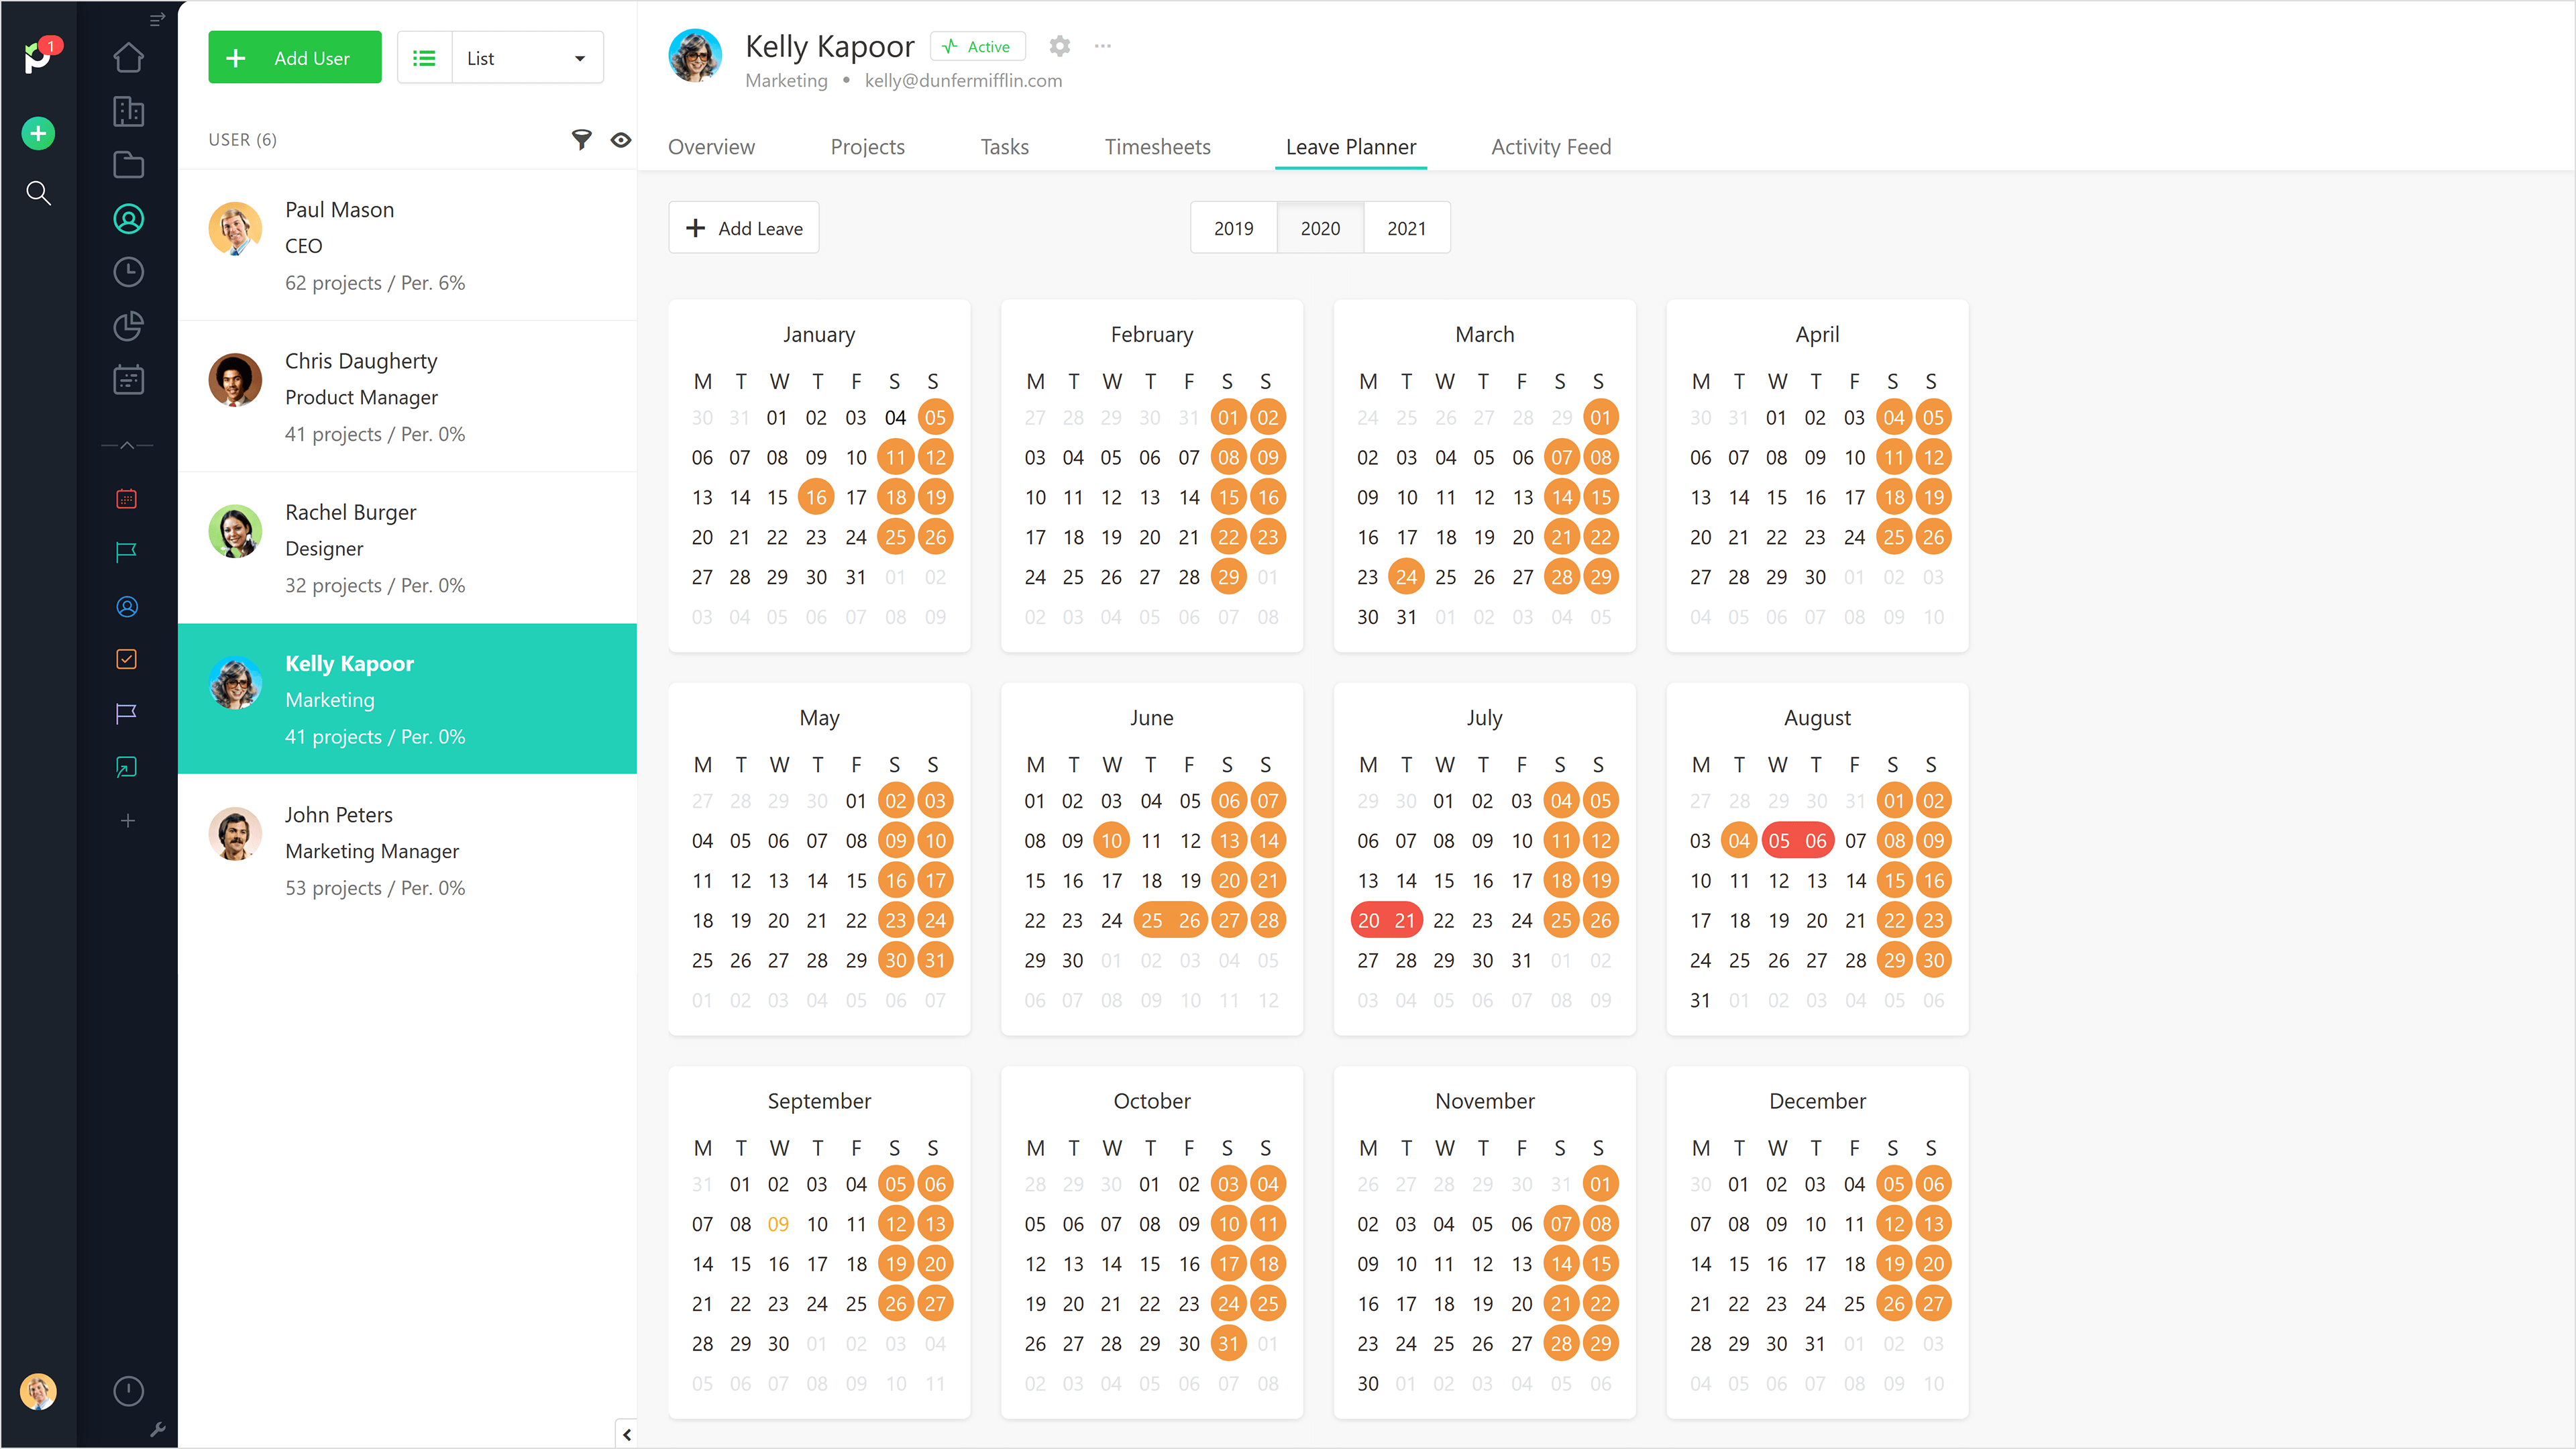 Leave Planner